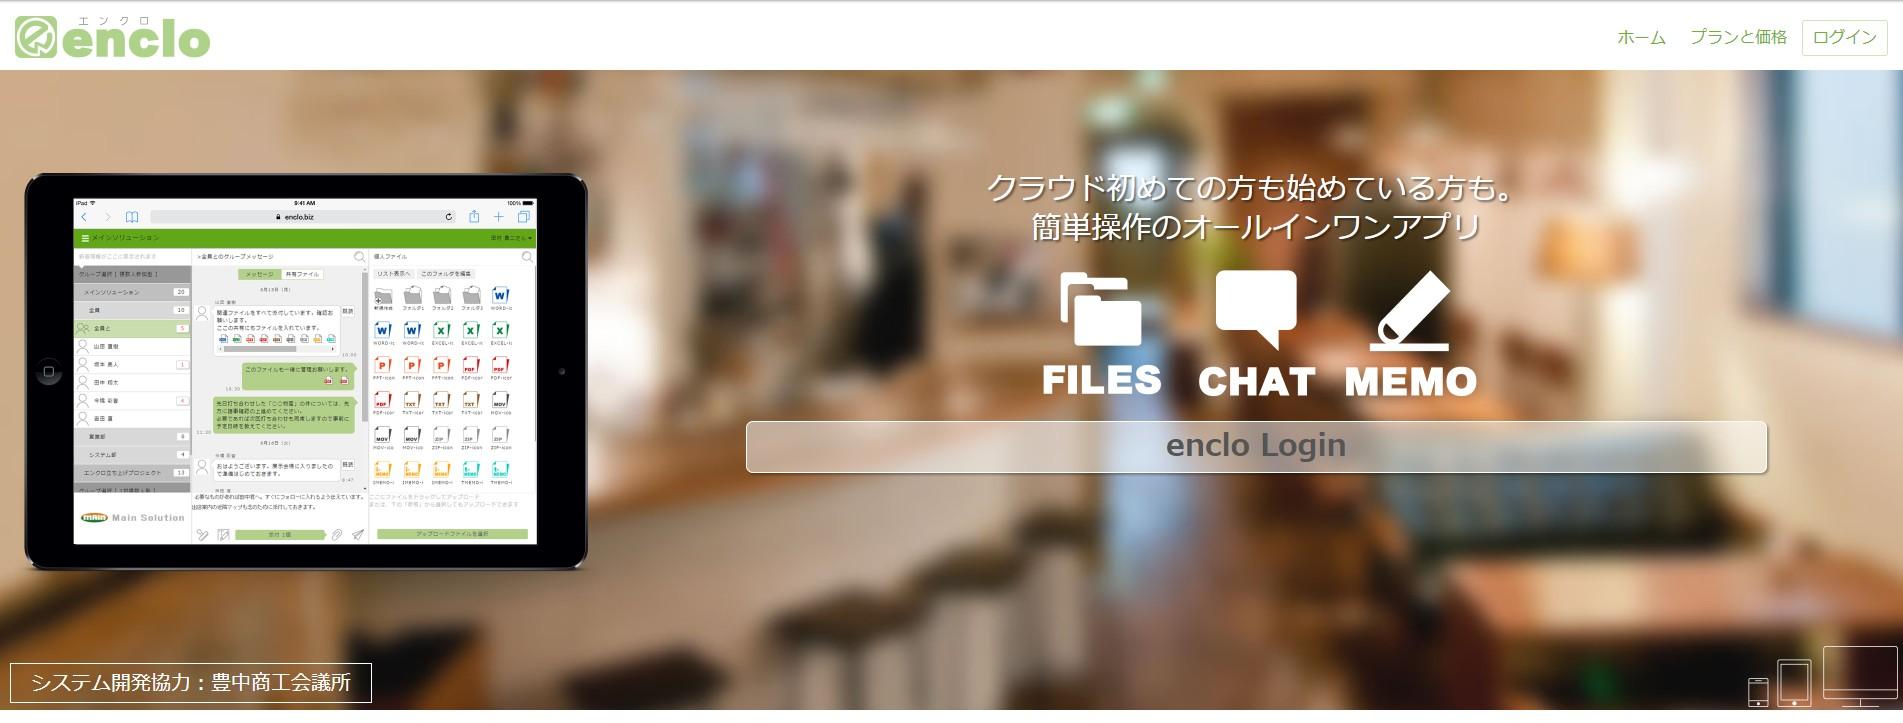 encloの公式トップページイメージ